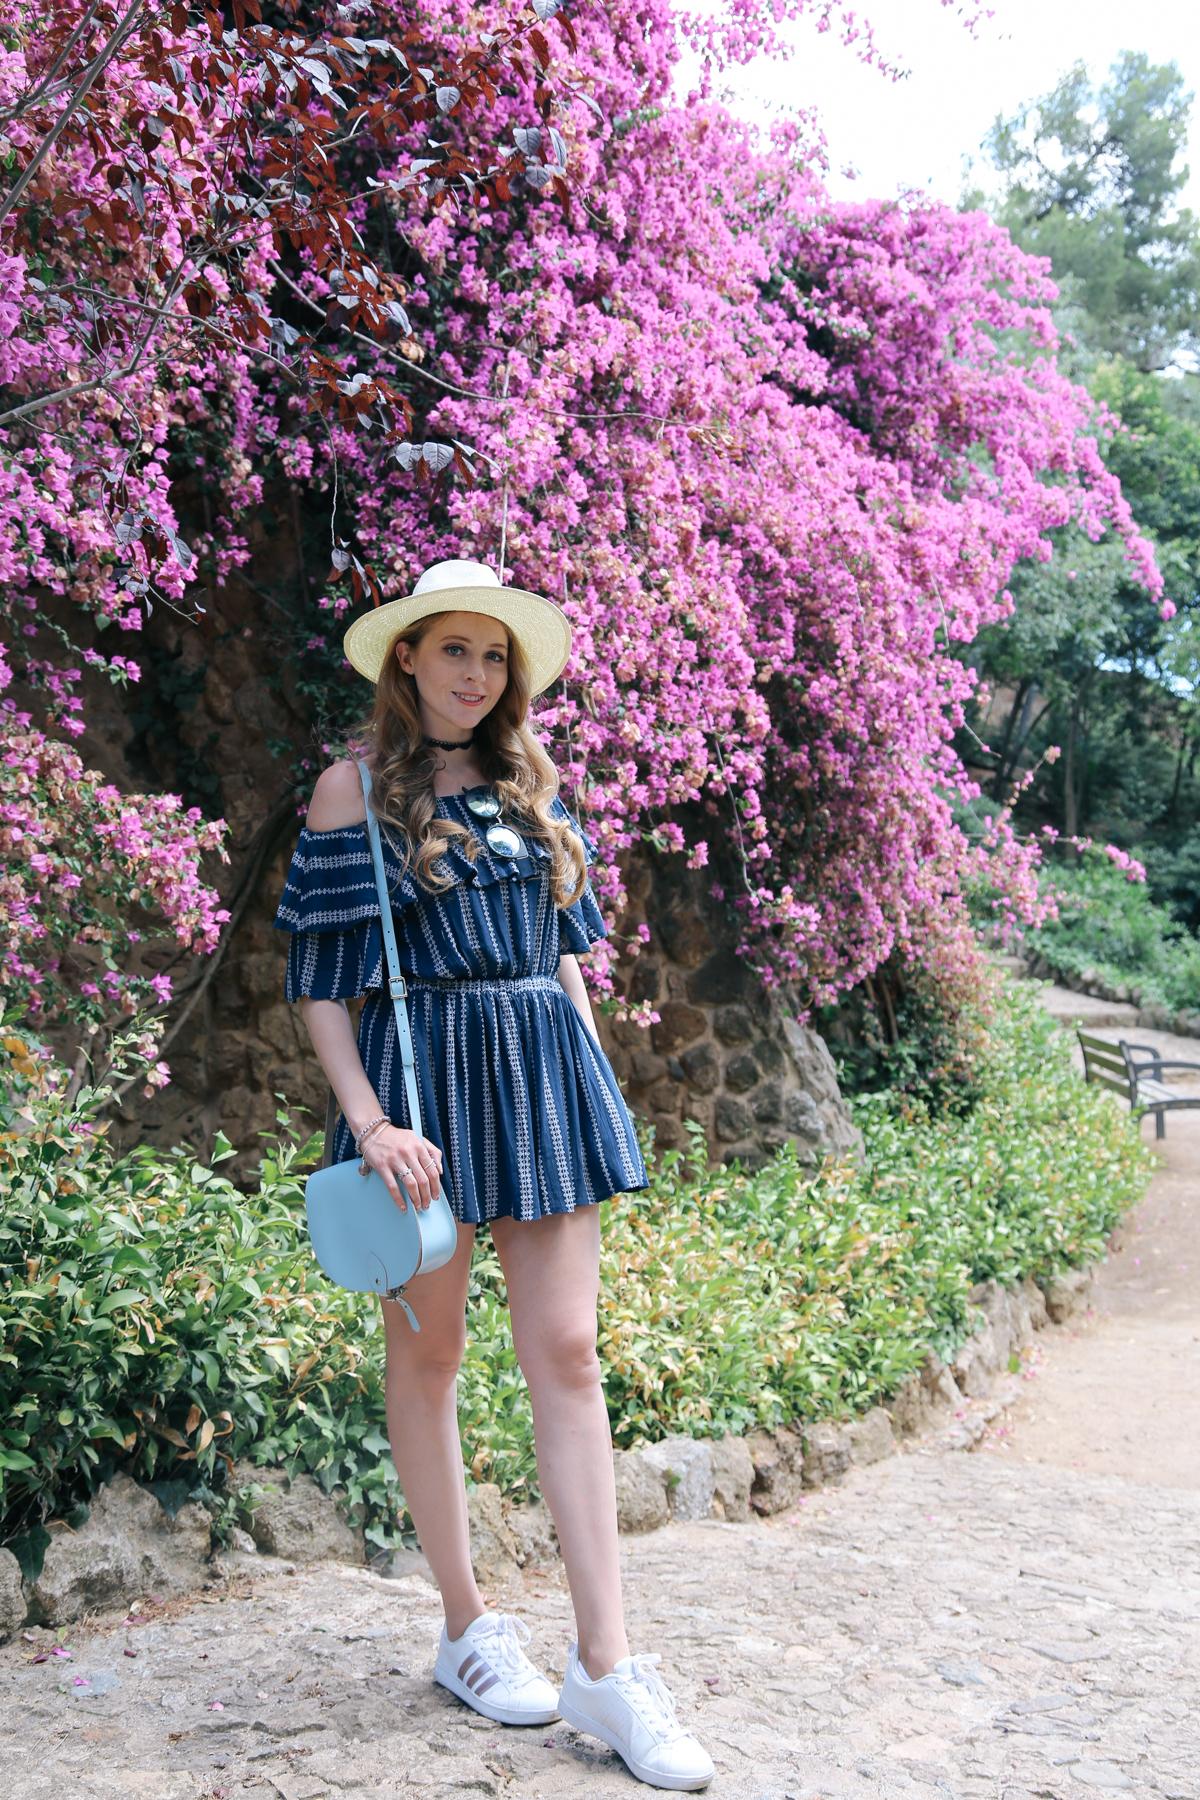 barcelona gardens flowers visit